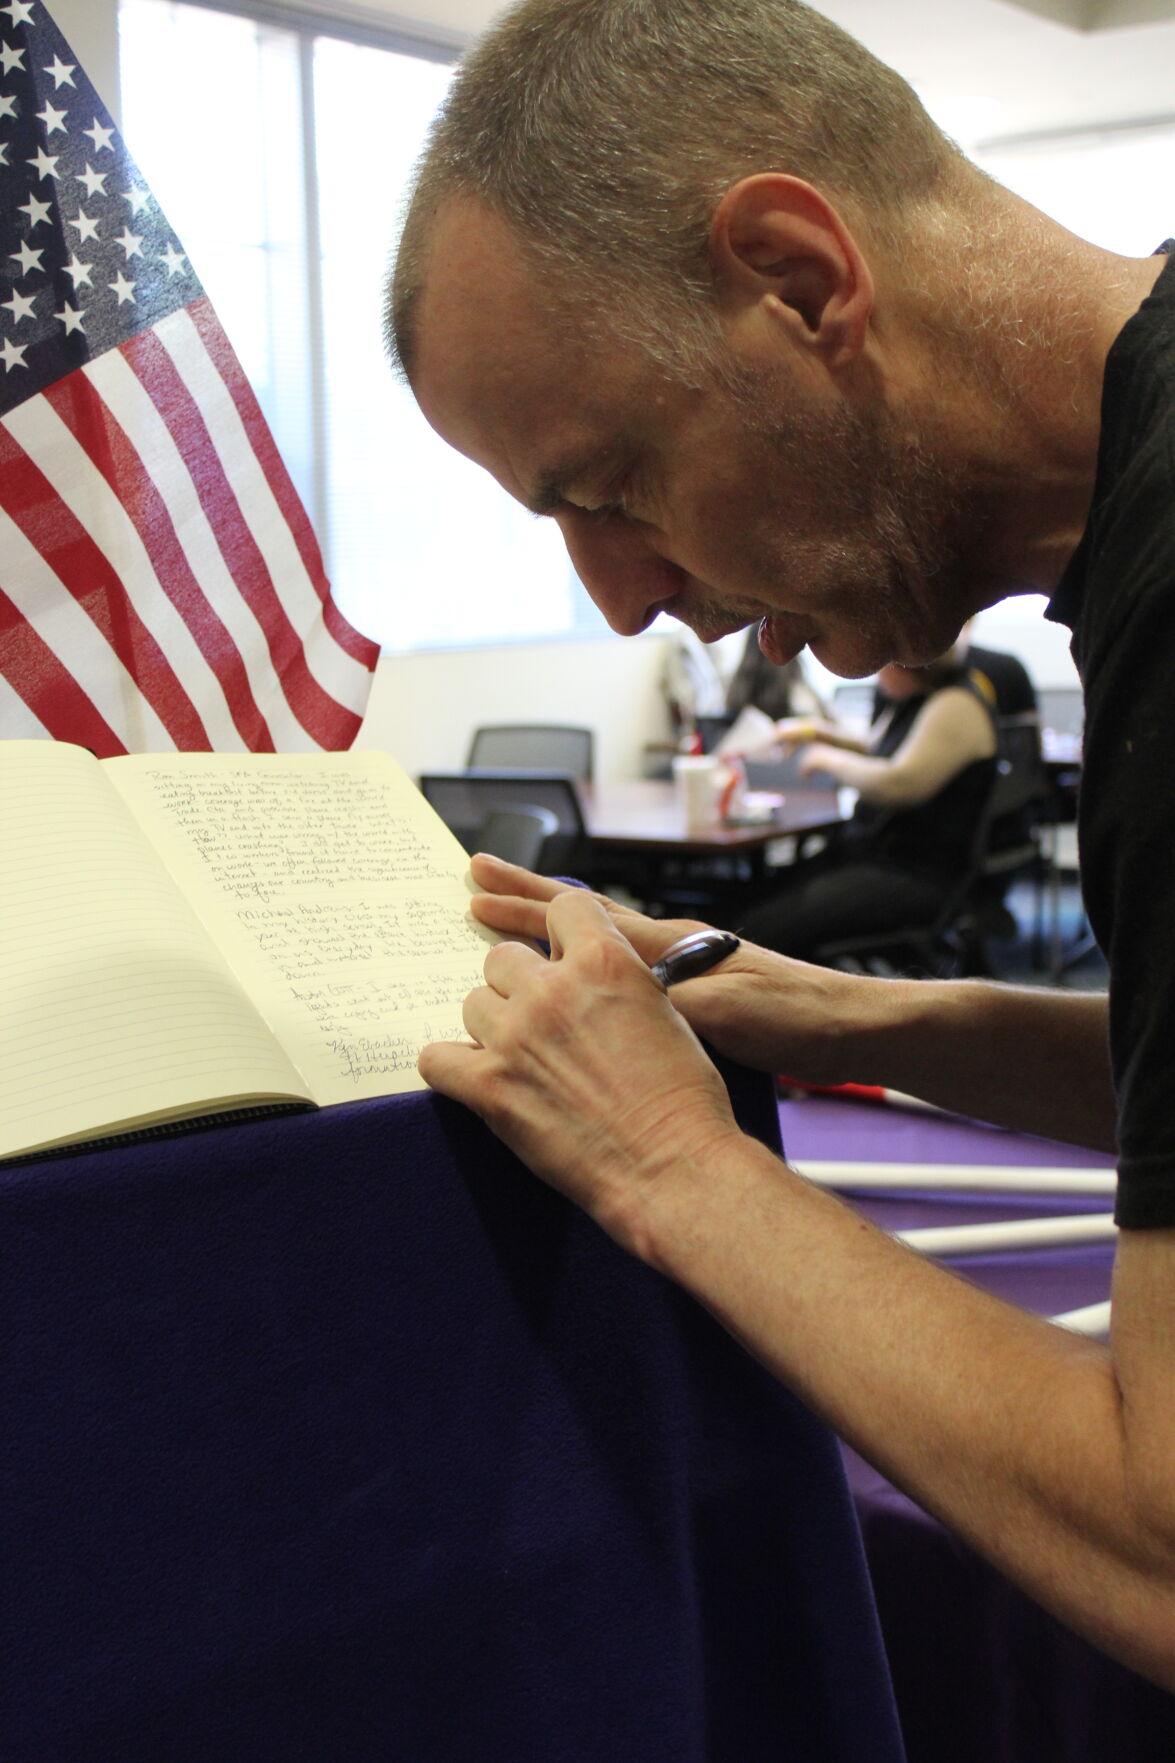 Veterans Resources Center helps commemorate 9/11